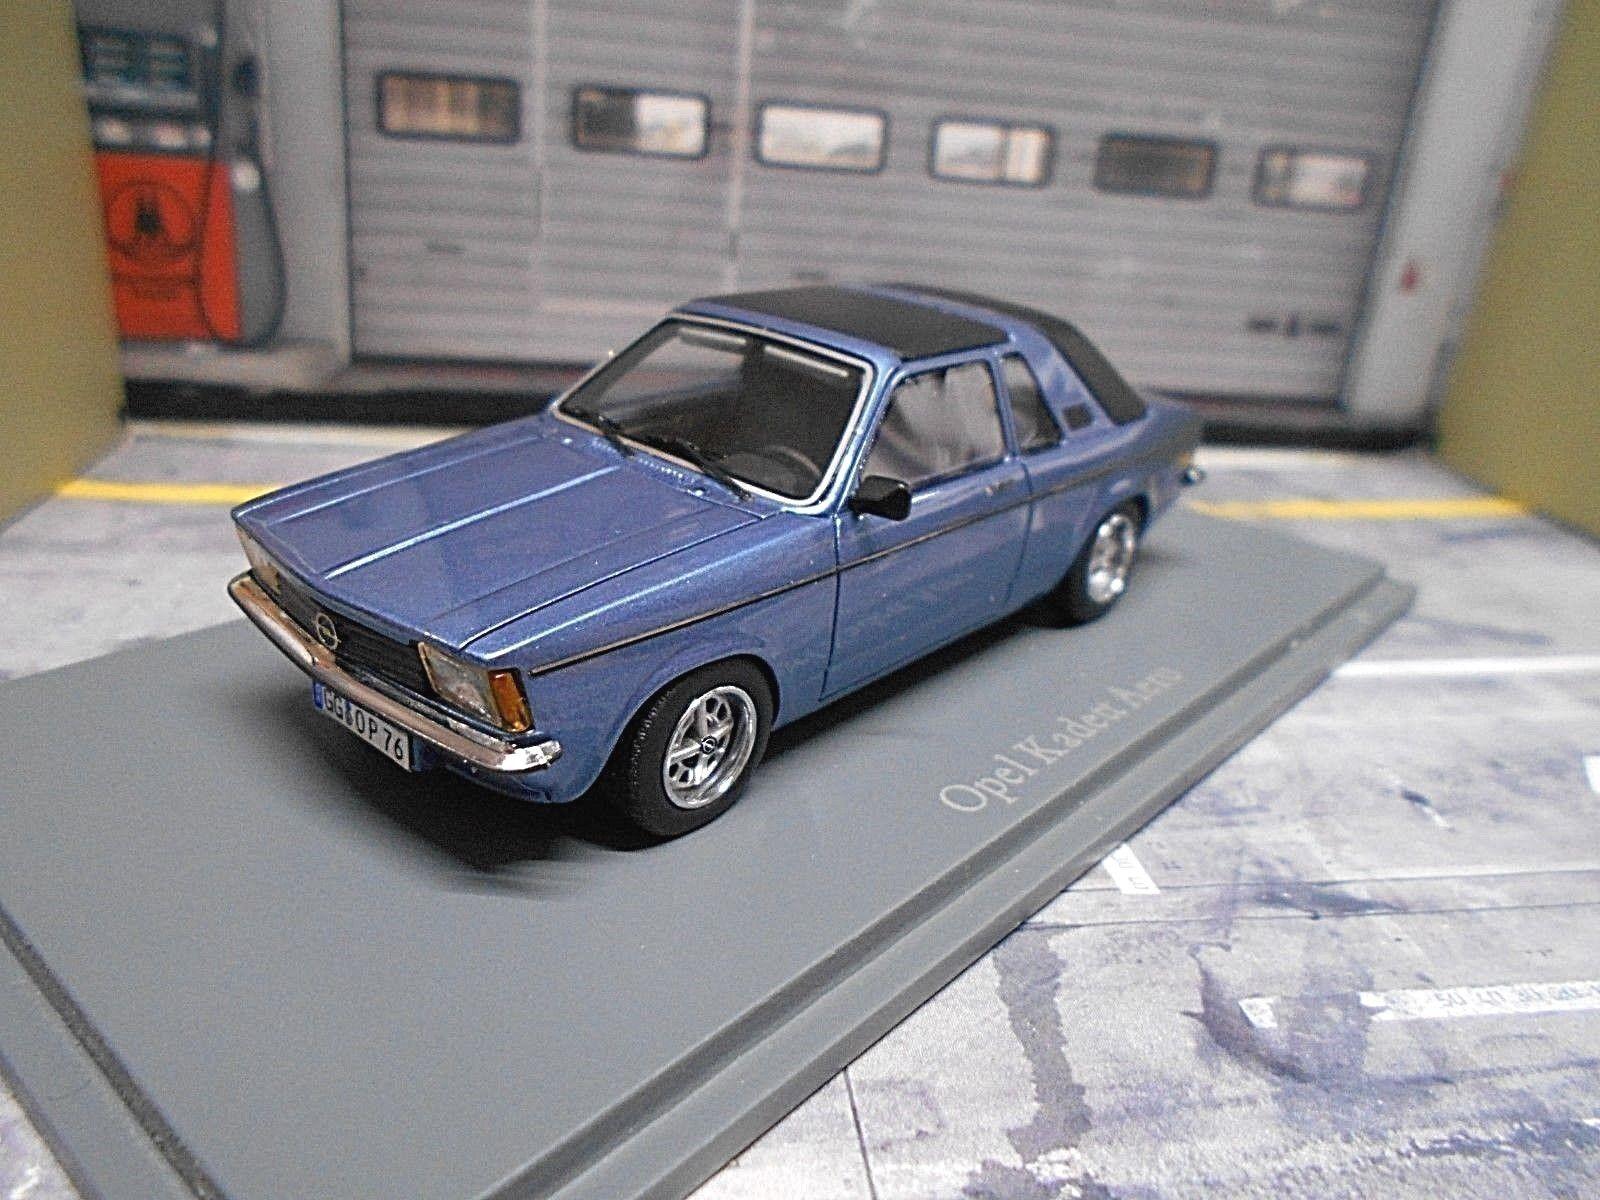 OPEL KADETT C CABRIO CABRIOLET AERO Blu Blue Neo 1/500 Limited Resin 1:43